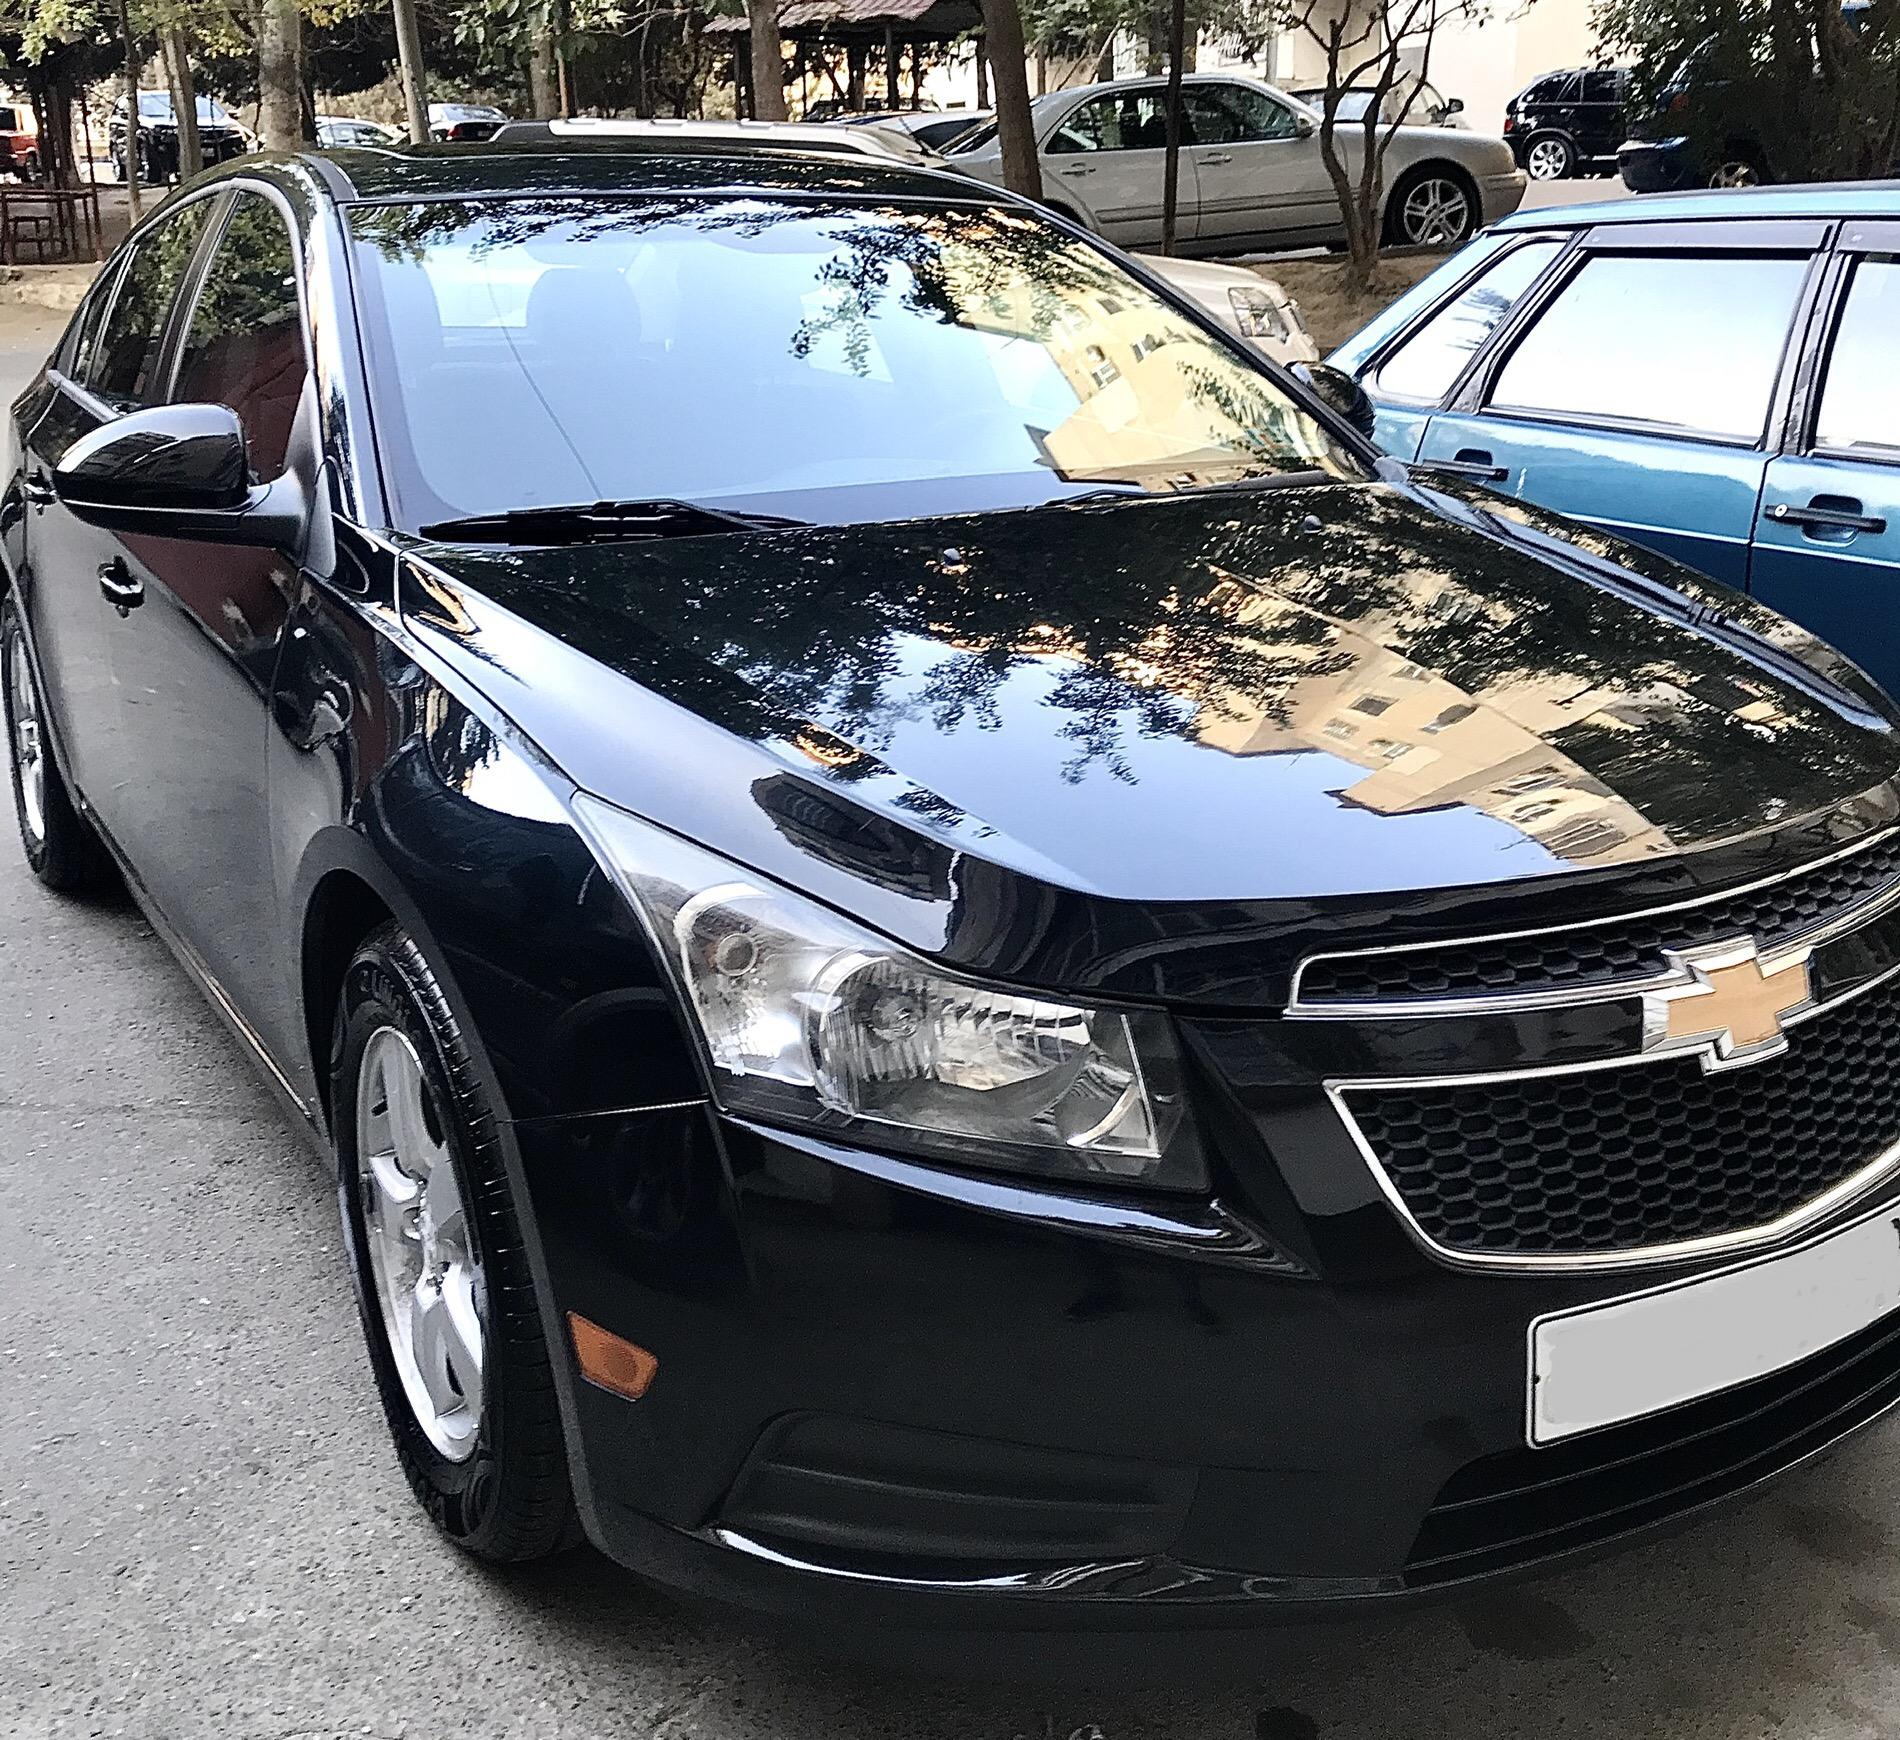 Chevrolet Cruze 1.4(lt) 2012 İkinci əl  $8600